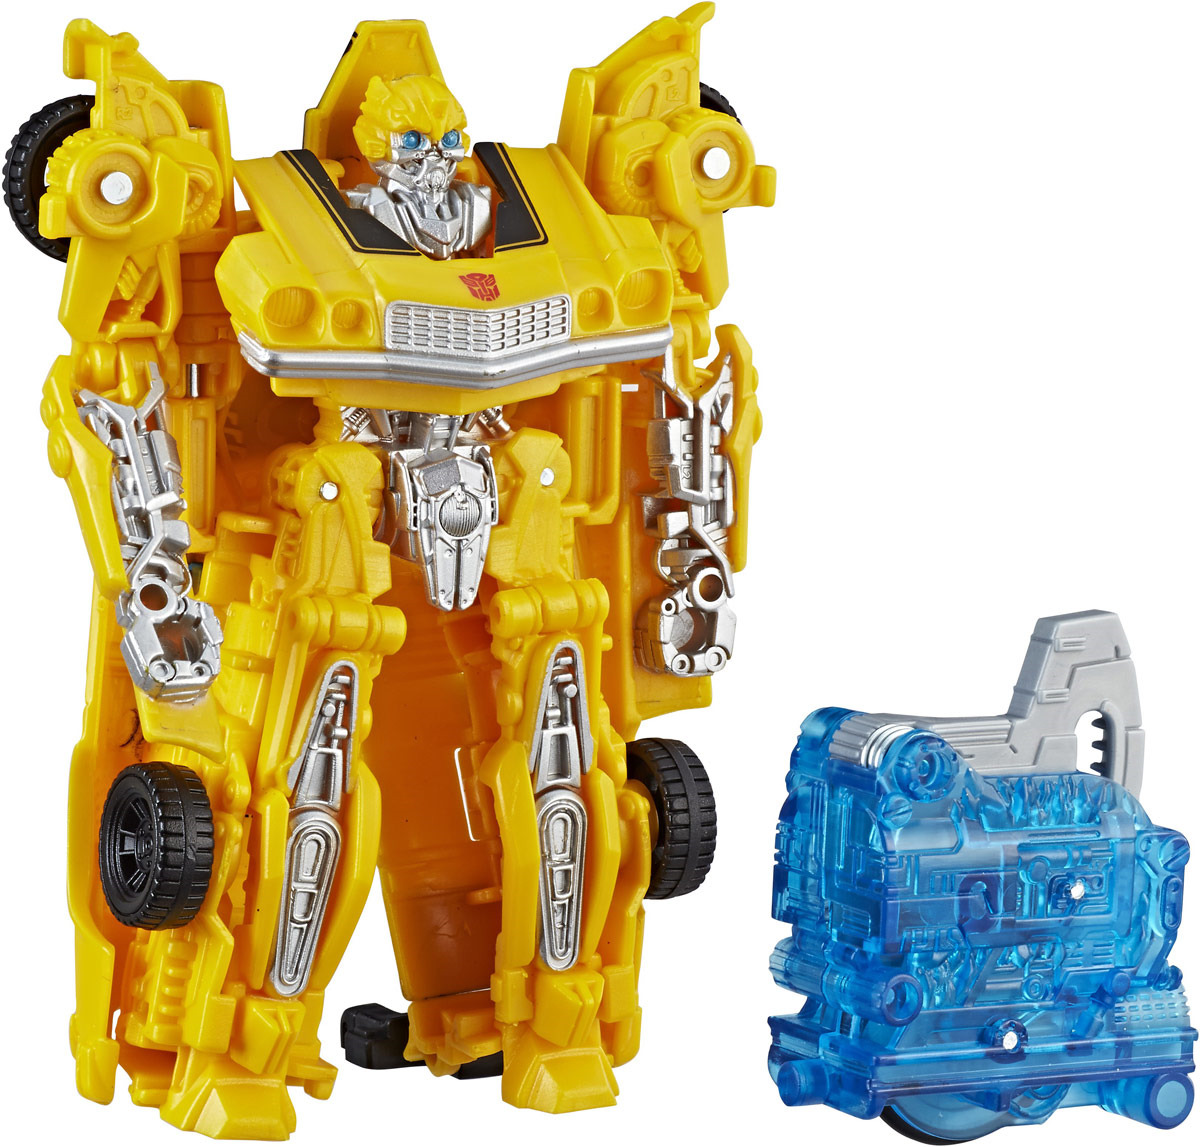 Трансформер Transformers Energon Igniters Bumblebee, E2087EU4__E2092ES0 автомобиль dickie трансформер bumblebee желтый 3113000